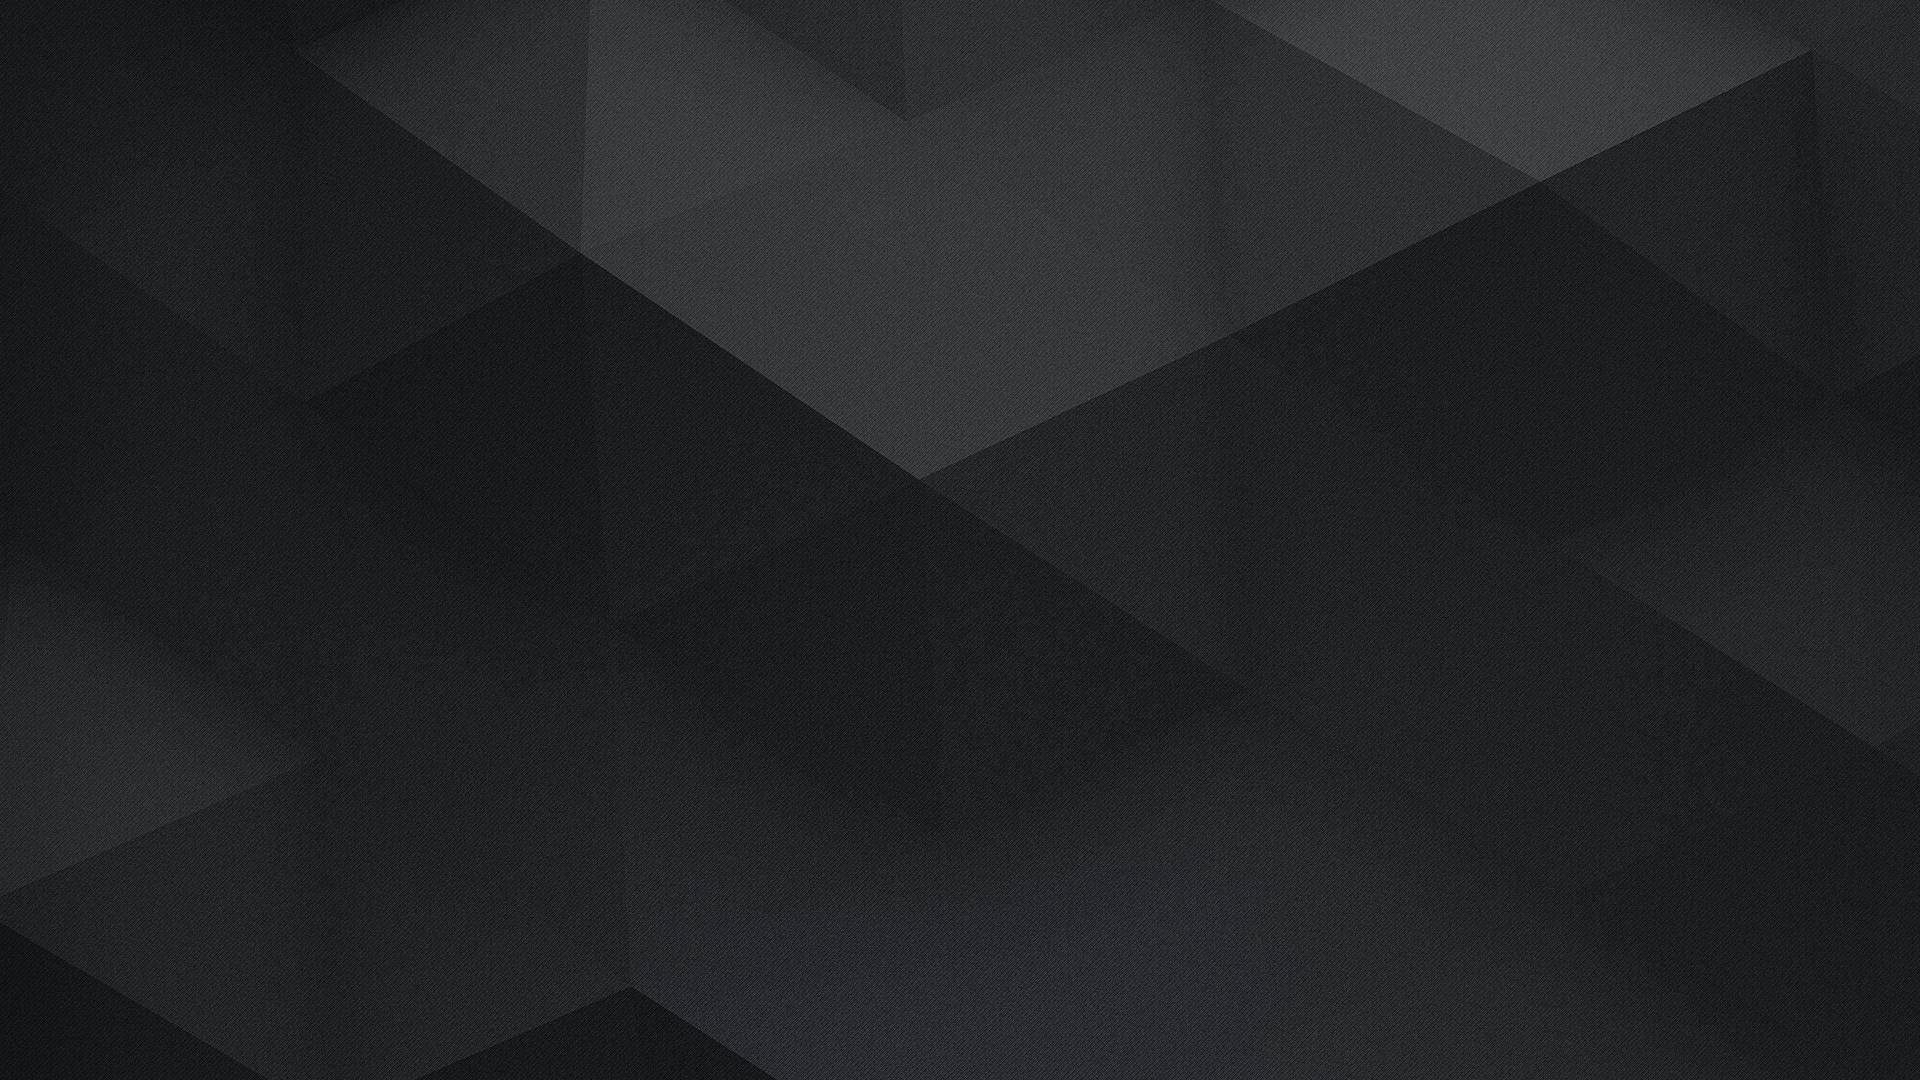 3d 4k Black Geometric Triangles Dark 4k Wallpaper Hdwallpaper Desktop In 2020 Abstract Wallpaper Digital Wallpaper Abstract